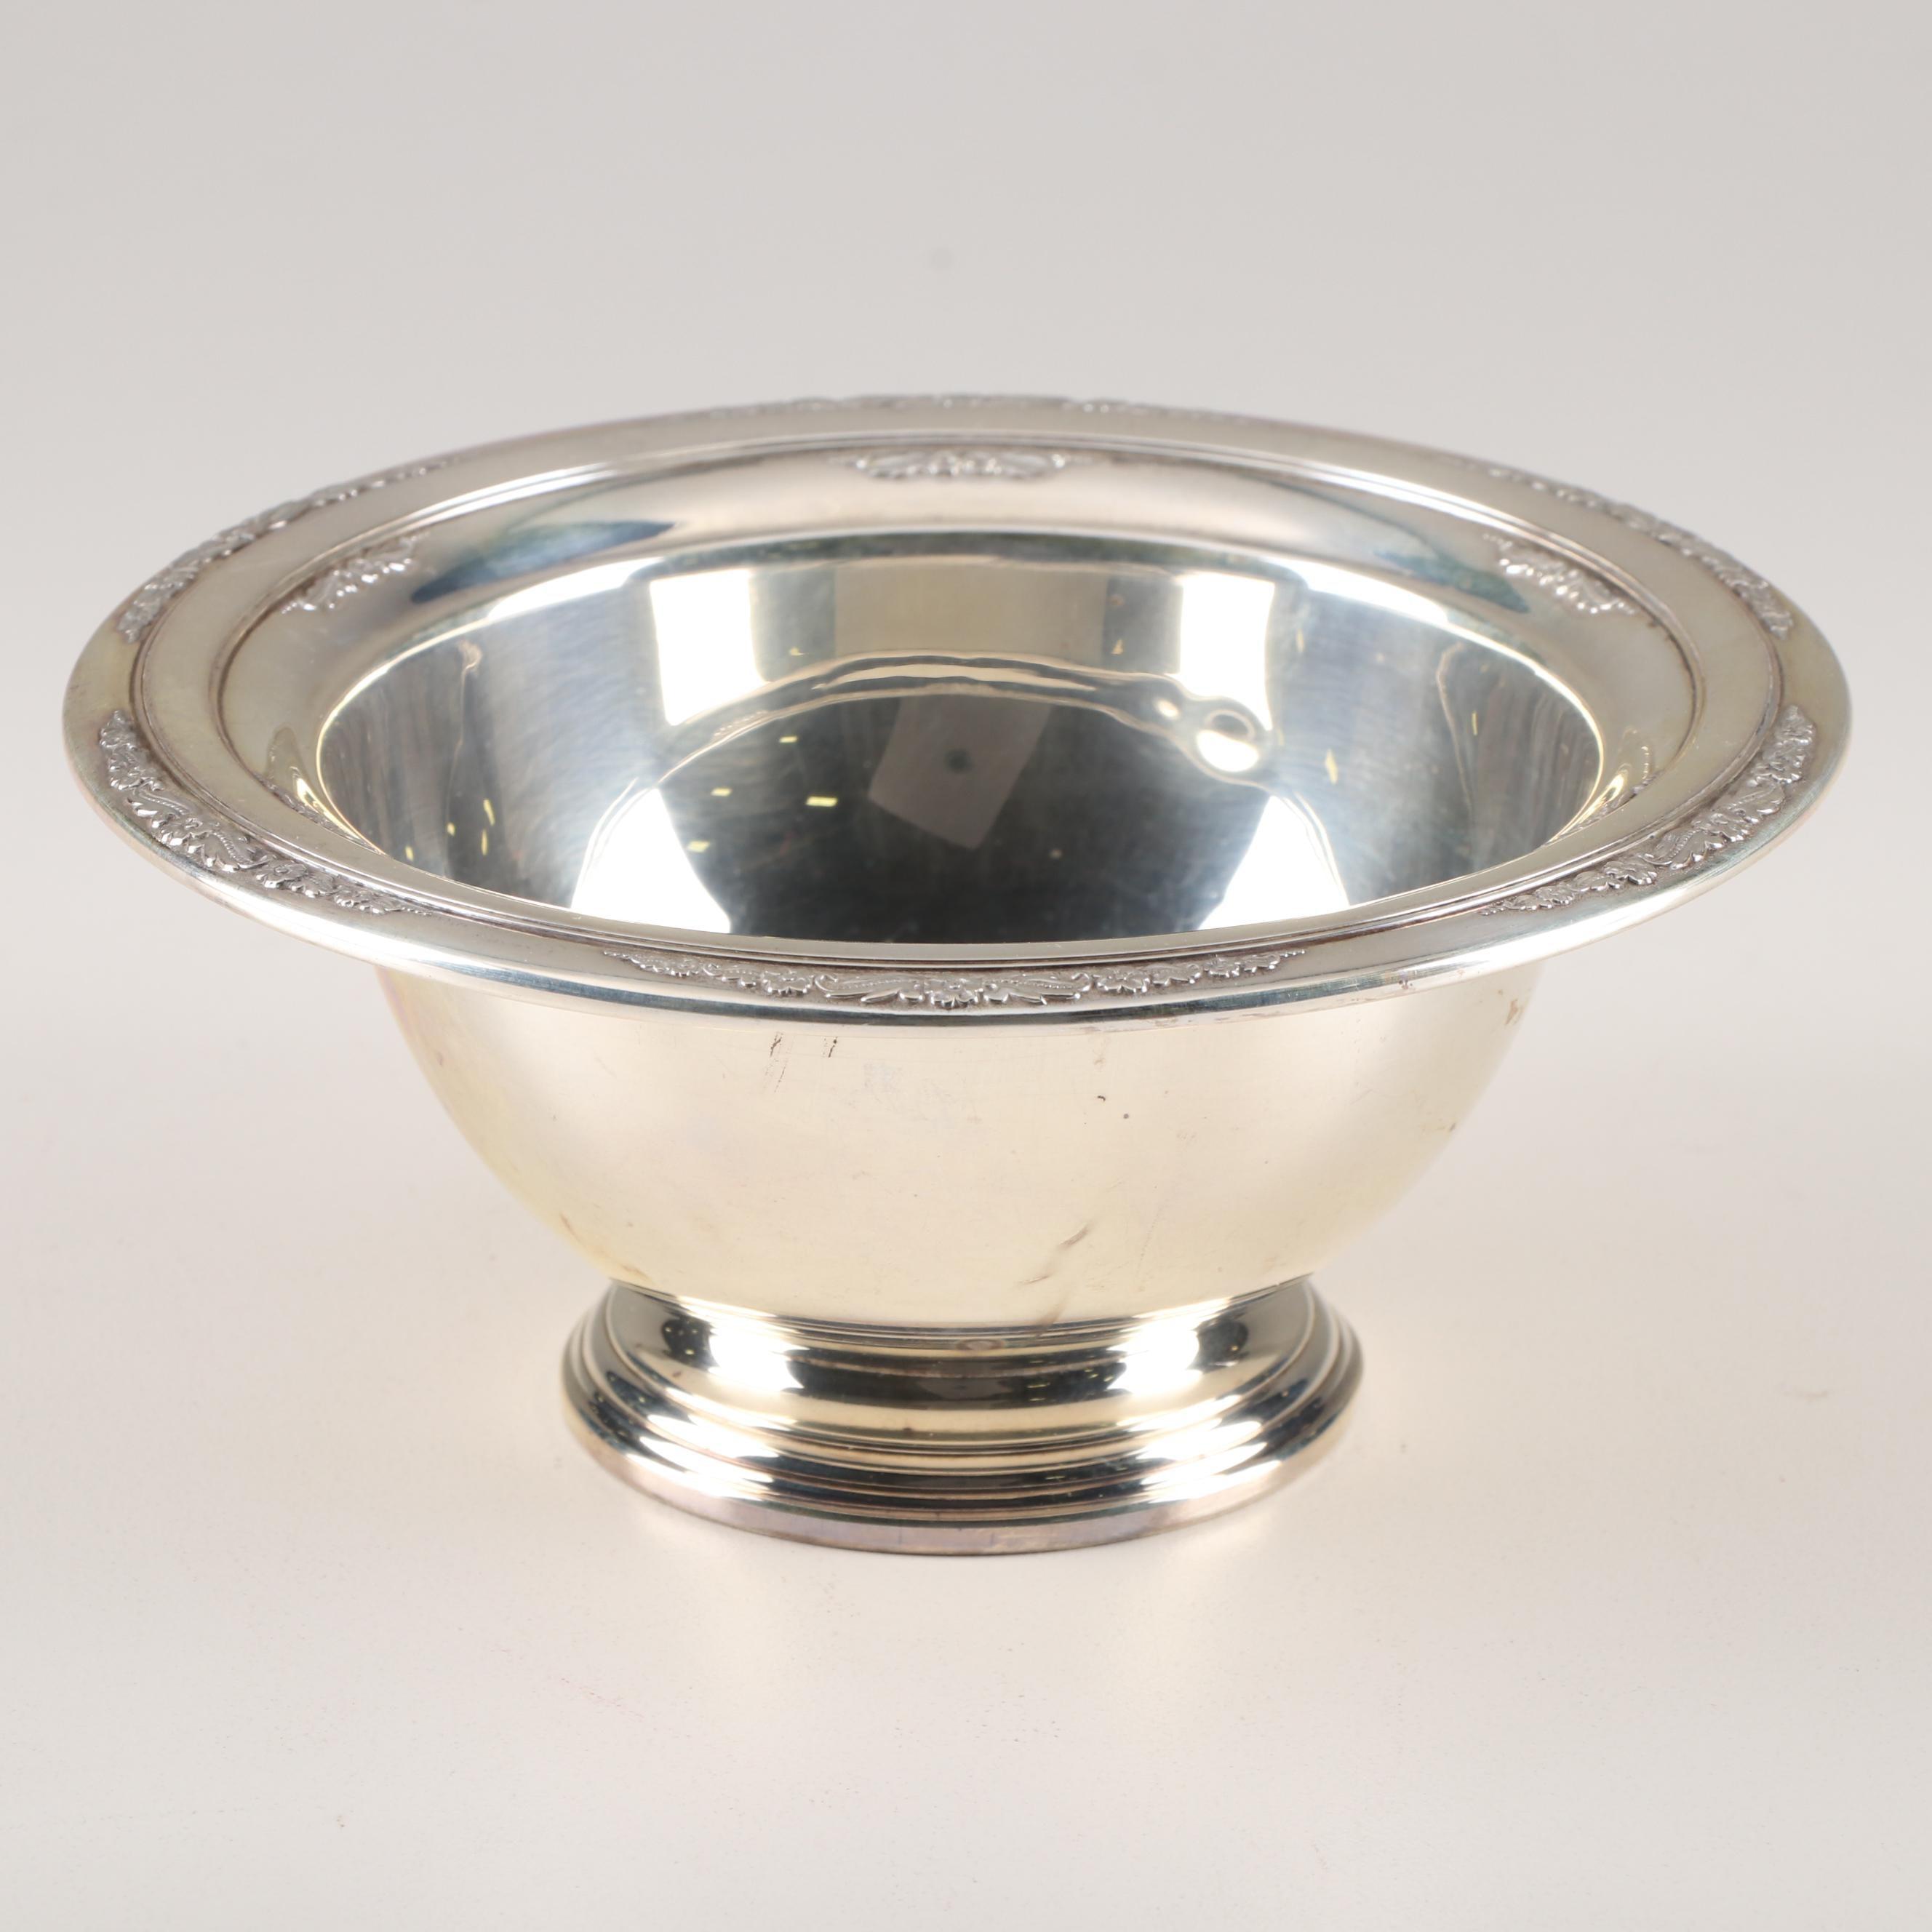 International Silver Sterling Silver Bowl